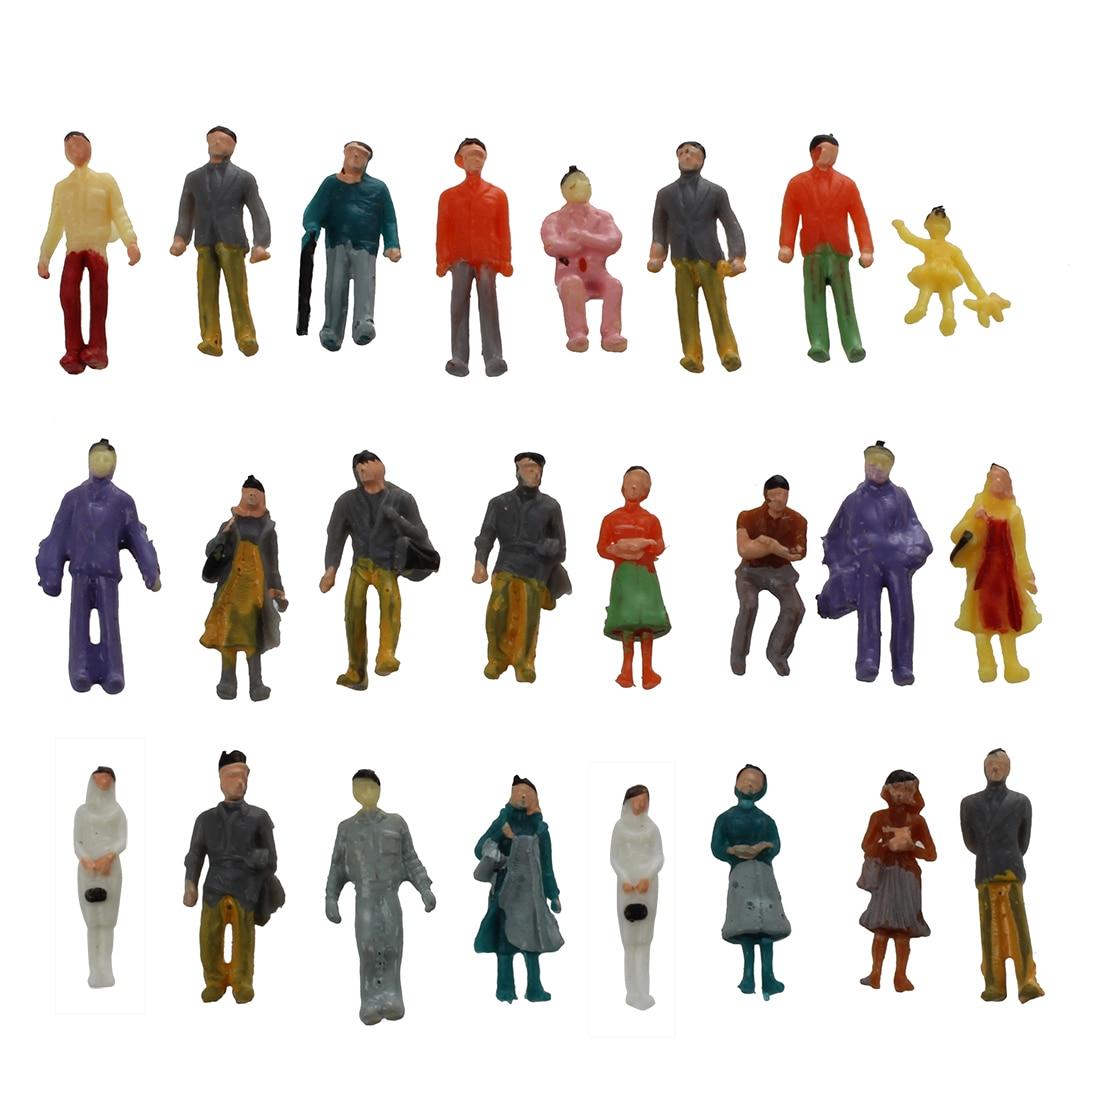 24 colado colorido pintado areia tabela modelo ferroviário passageiros figuras escala 1 a 87